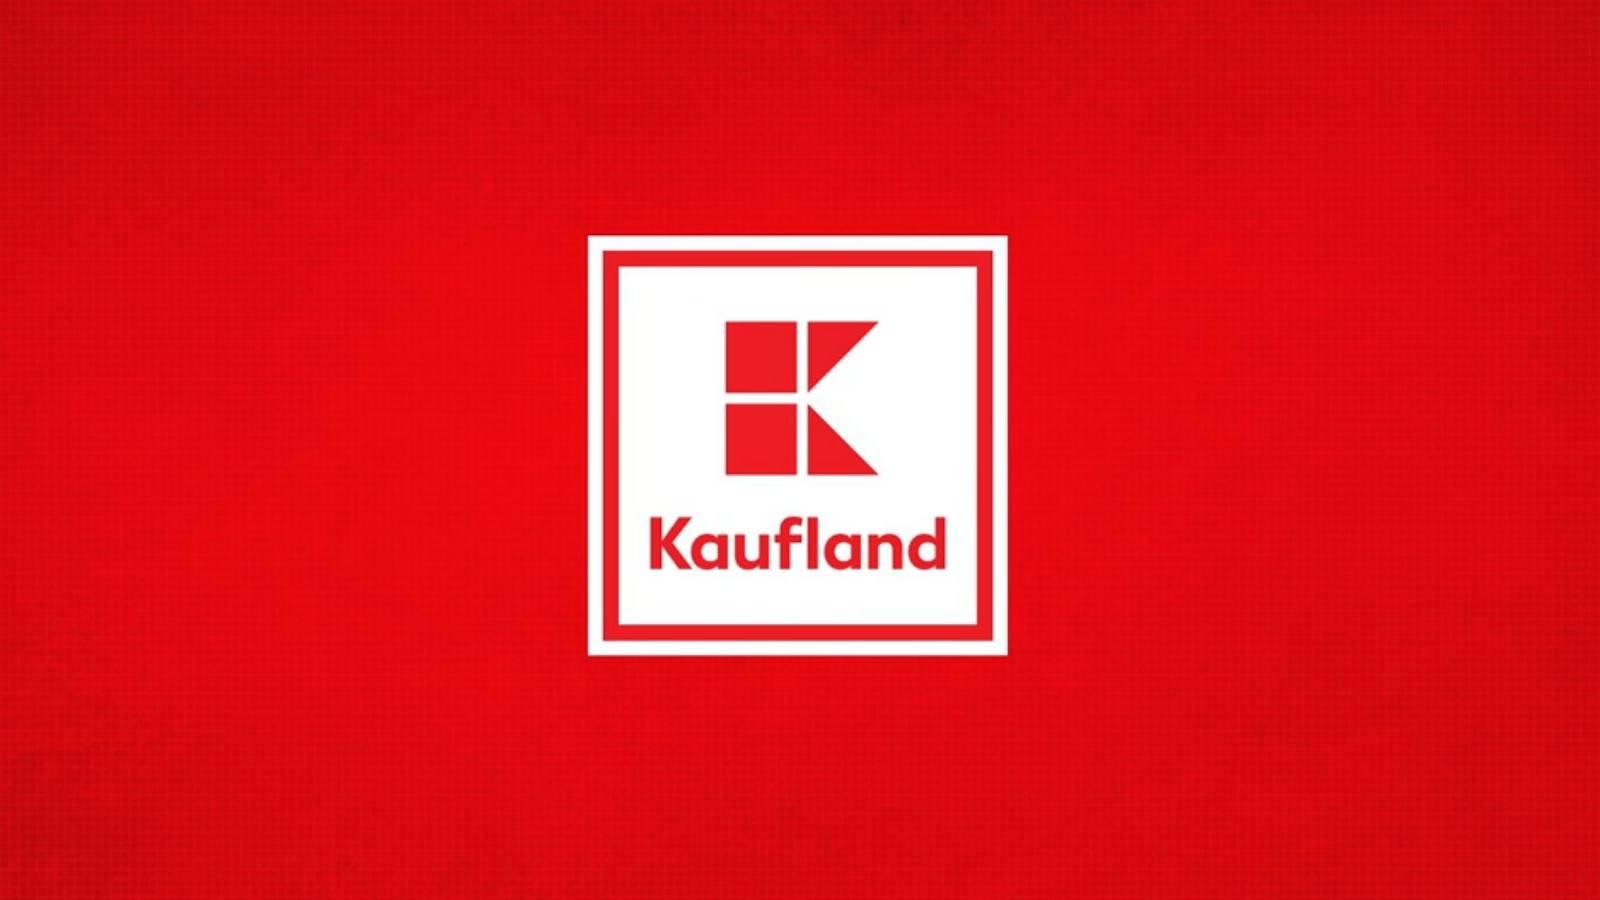 Kaufland electronica